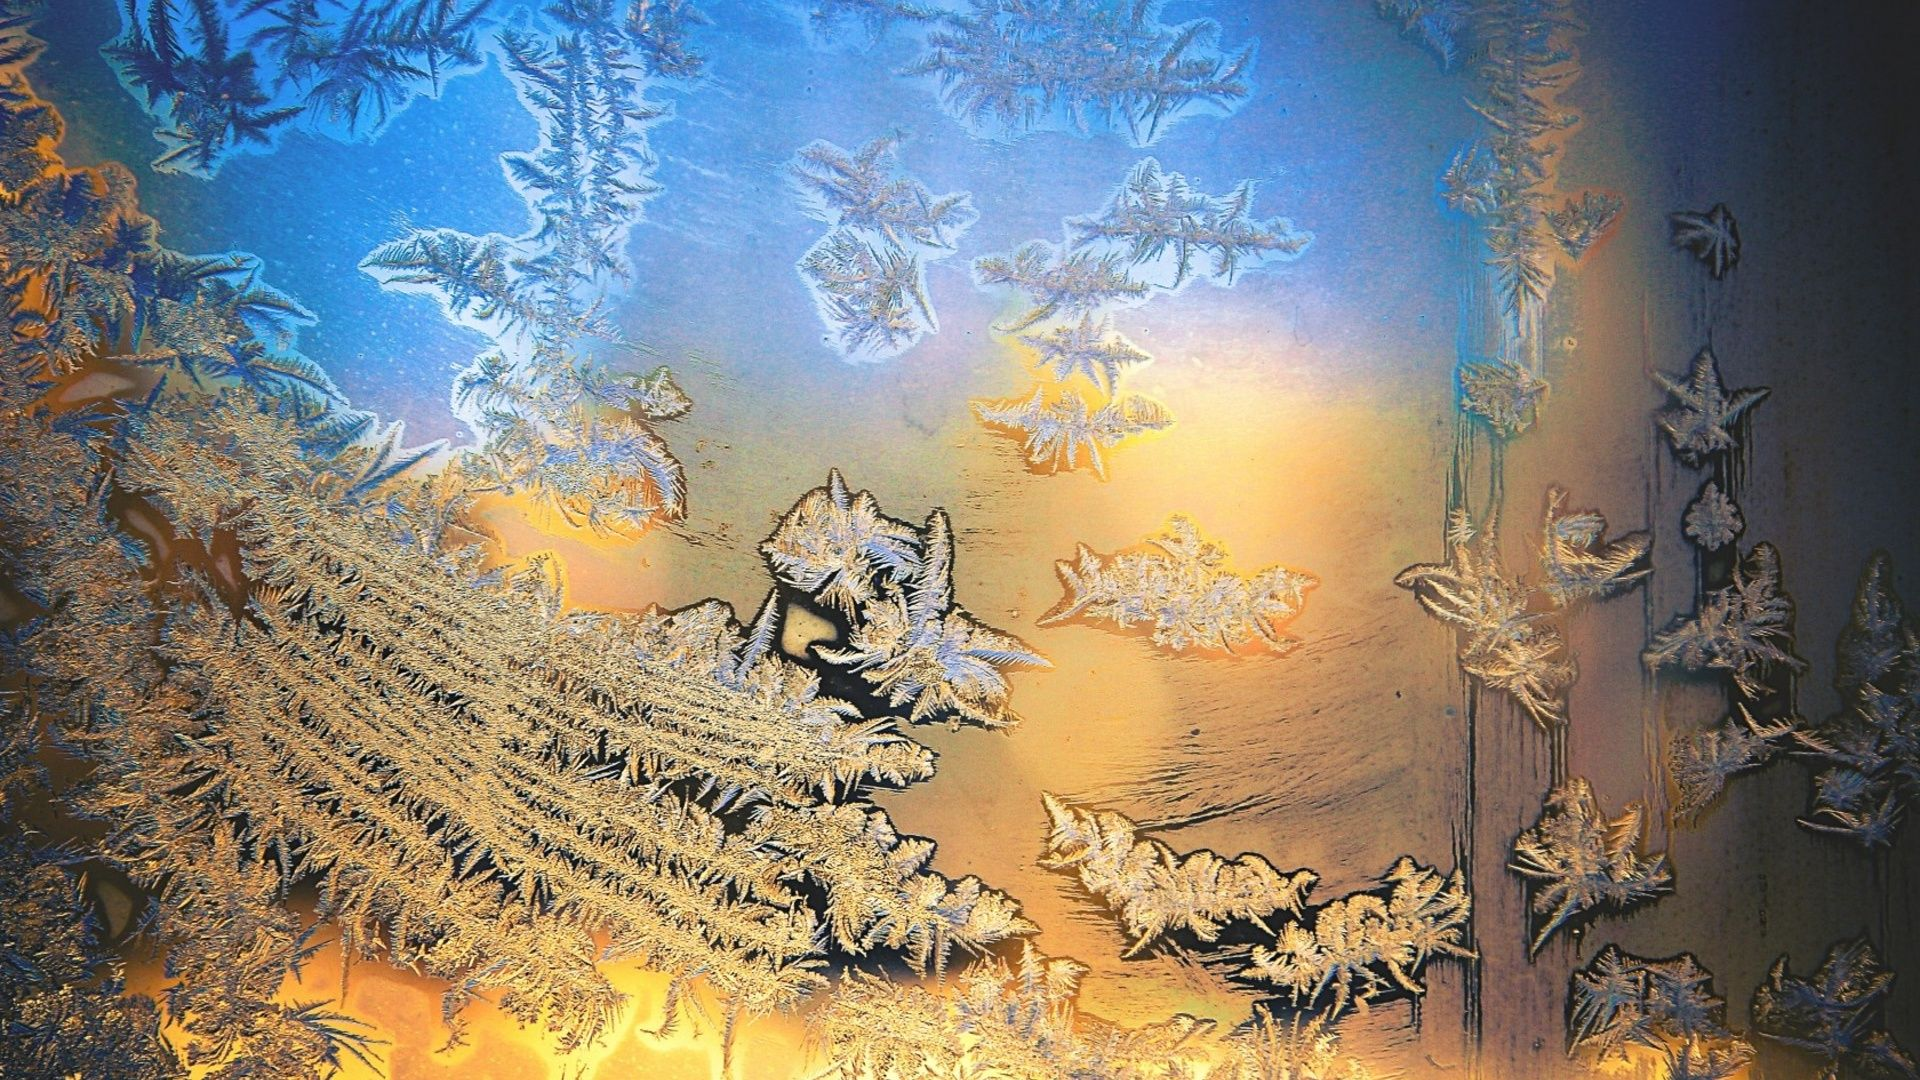 Winter Patterns On The Window wallpaper photo full hd